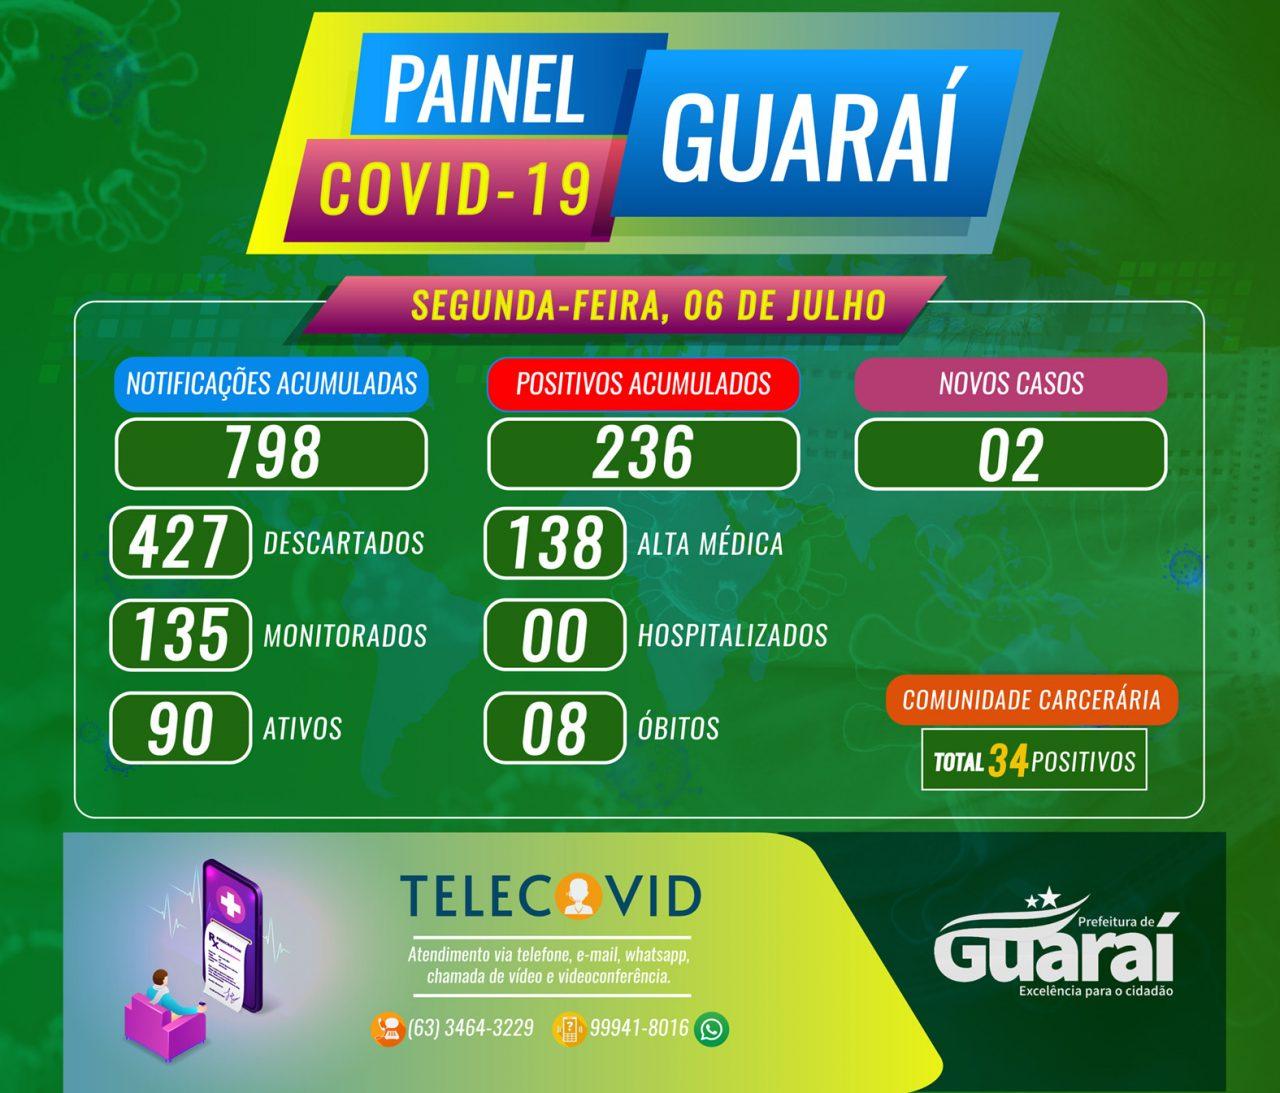 PAINEL GUARAI COVID19 SEGUNDA 6 DE JULHO 1280x1093 - PaineI Guaraí-TO / Covid-19 / Boletim 06 de Julho (segunda) 14:00